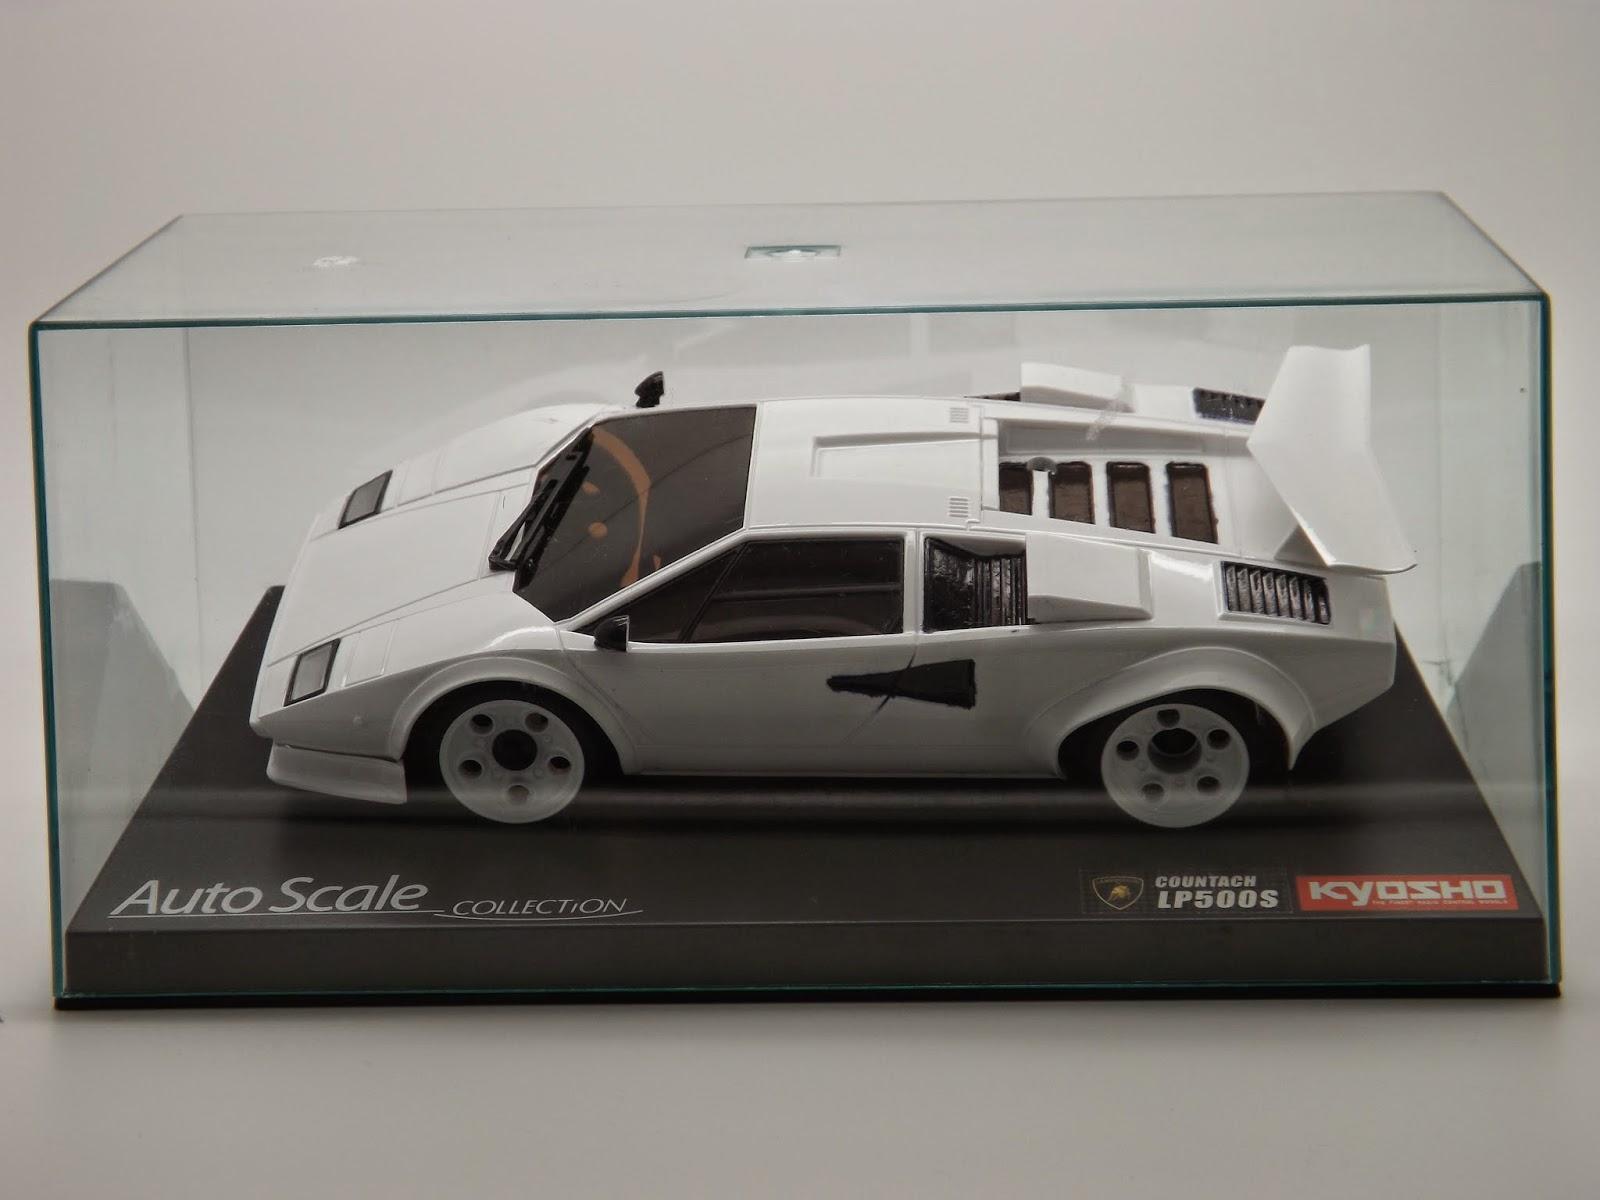 Kyoshosan Mini Z Collection Custom Painted Lamborghini Countach